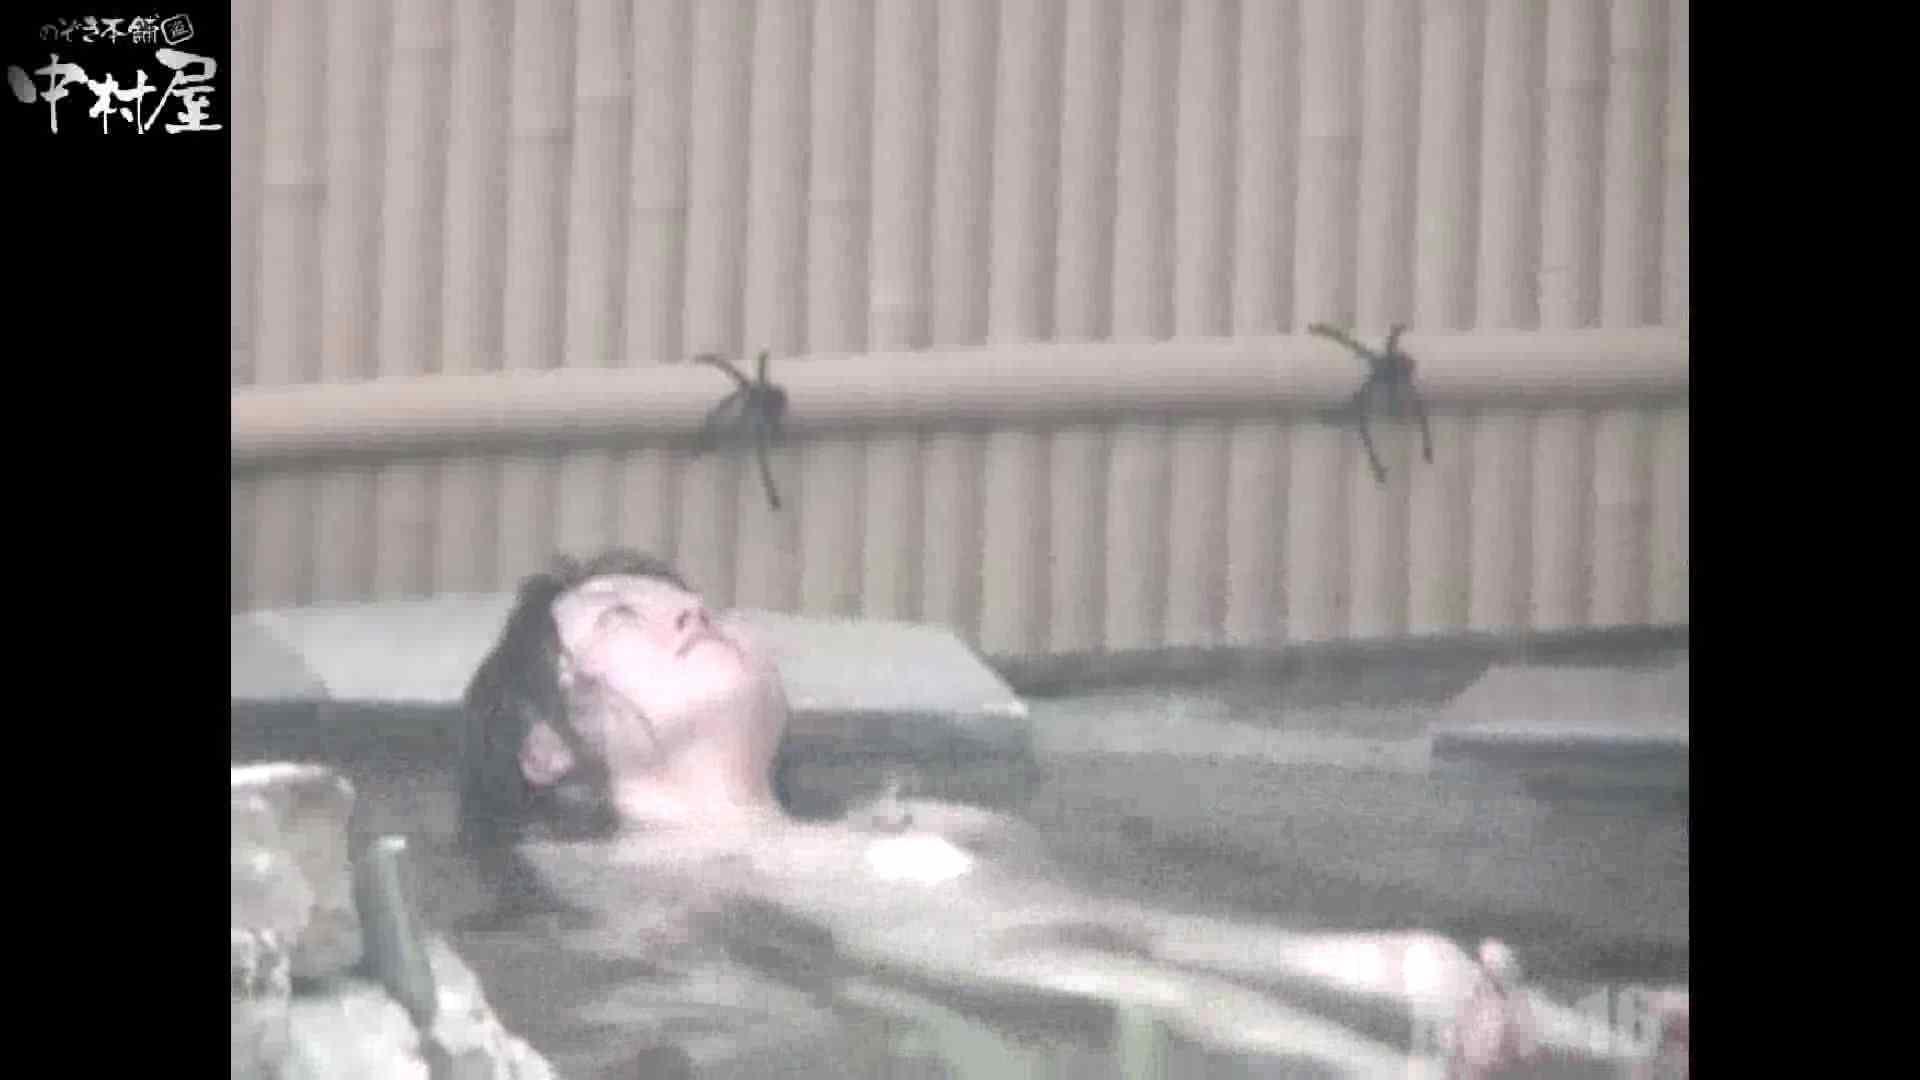 Aquaな露天風呂Vol.880潜入盗撮露天風呂十六判湯 其の八 潜入シリーズ | 盗撮  84pic 49